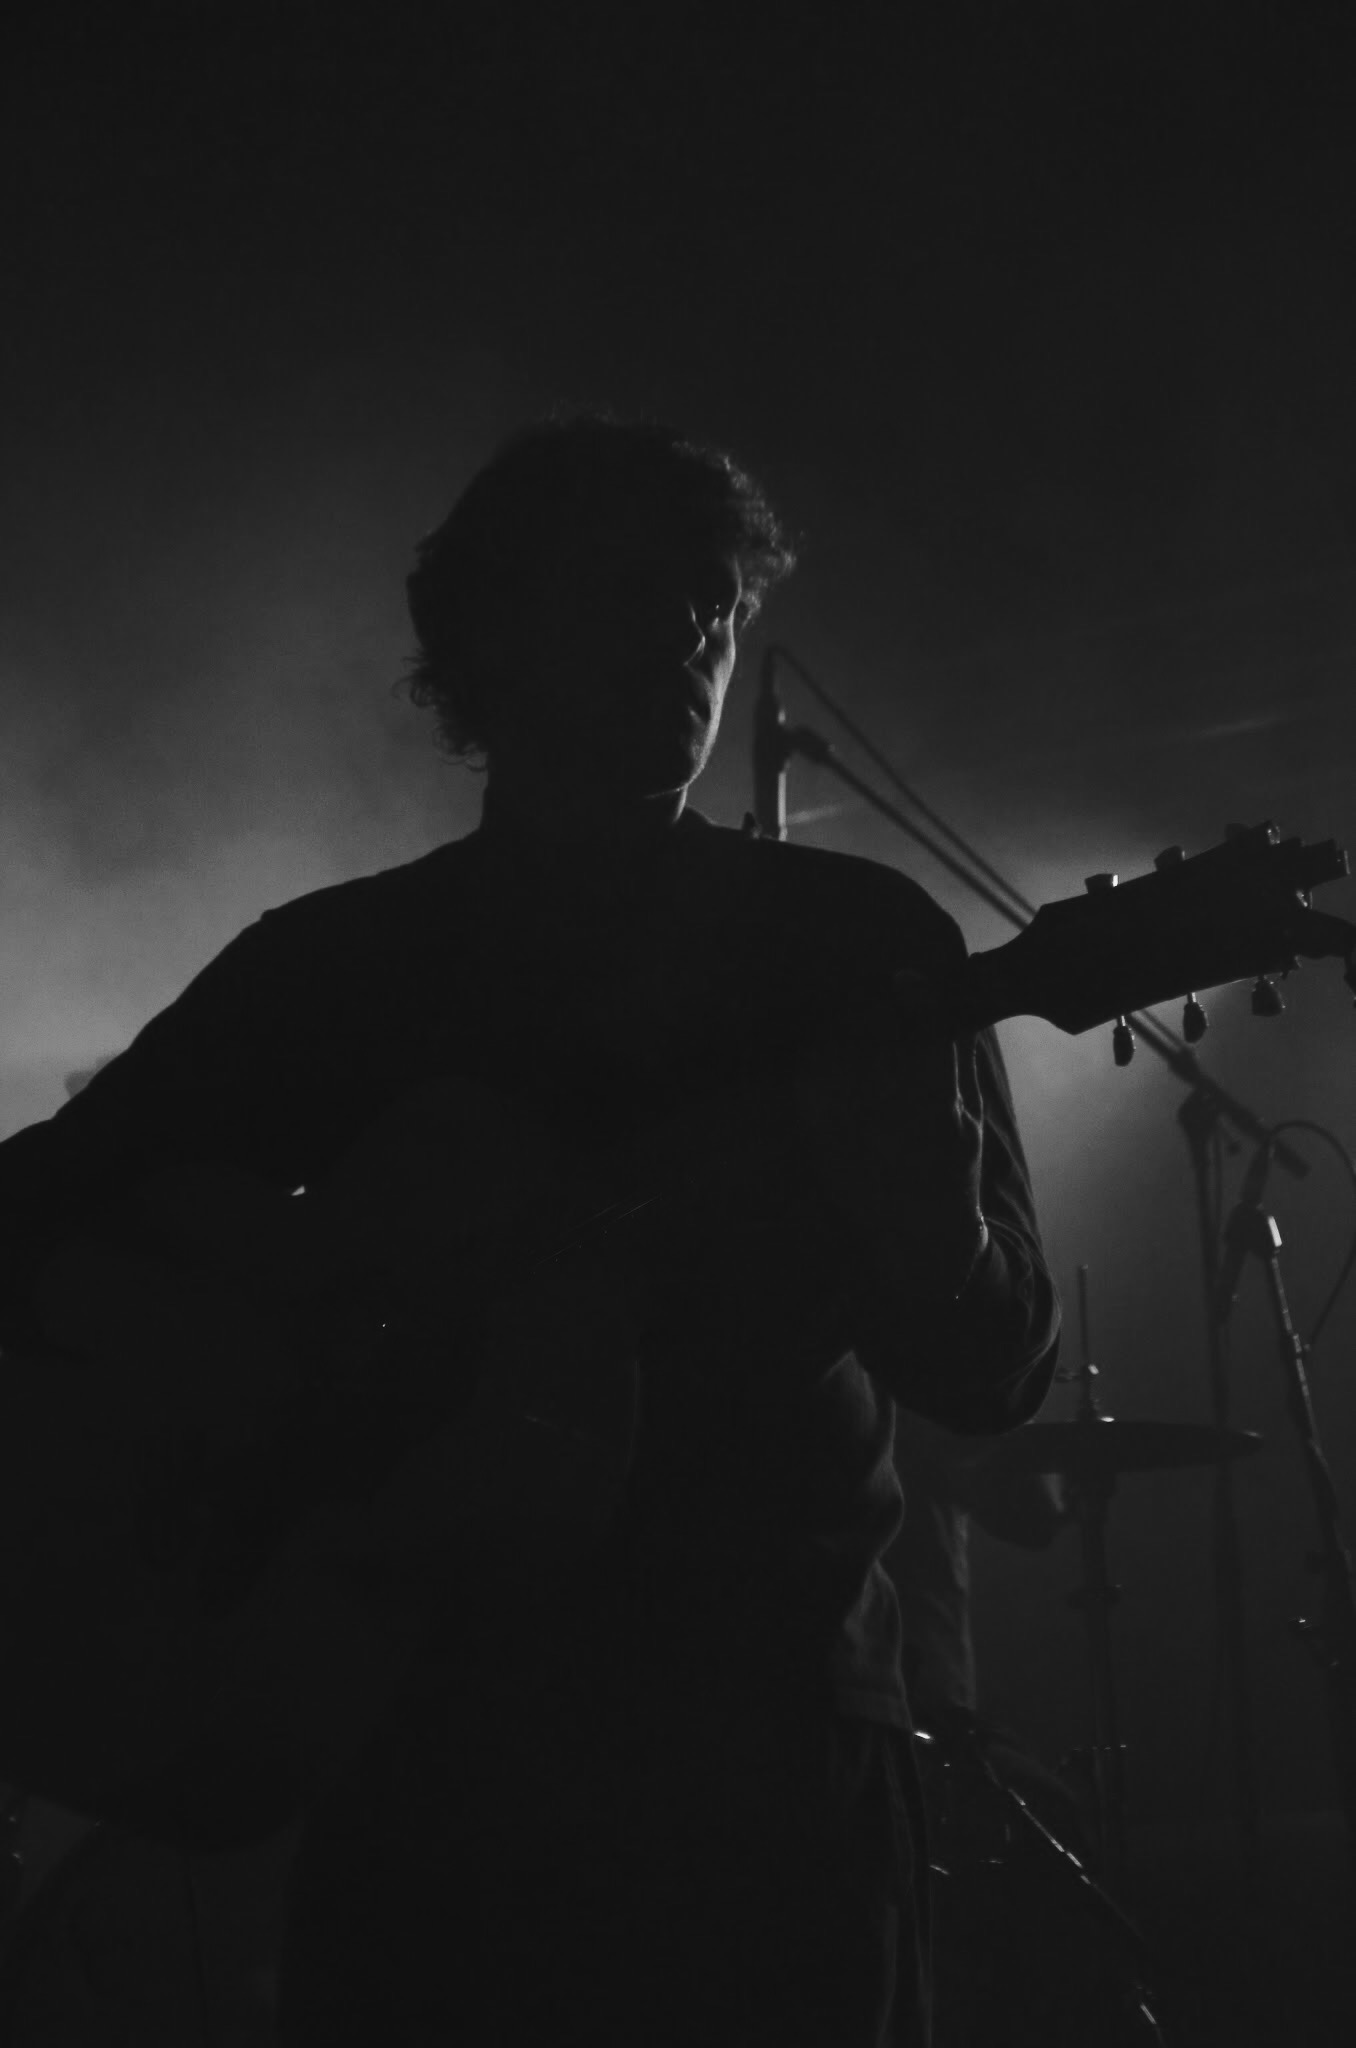 dmas music live review melbourne photo credit ryley clarke savage thrills savagethrills 8